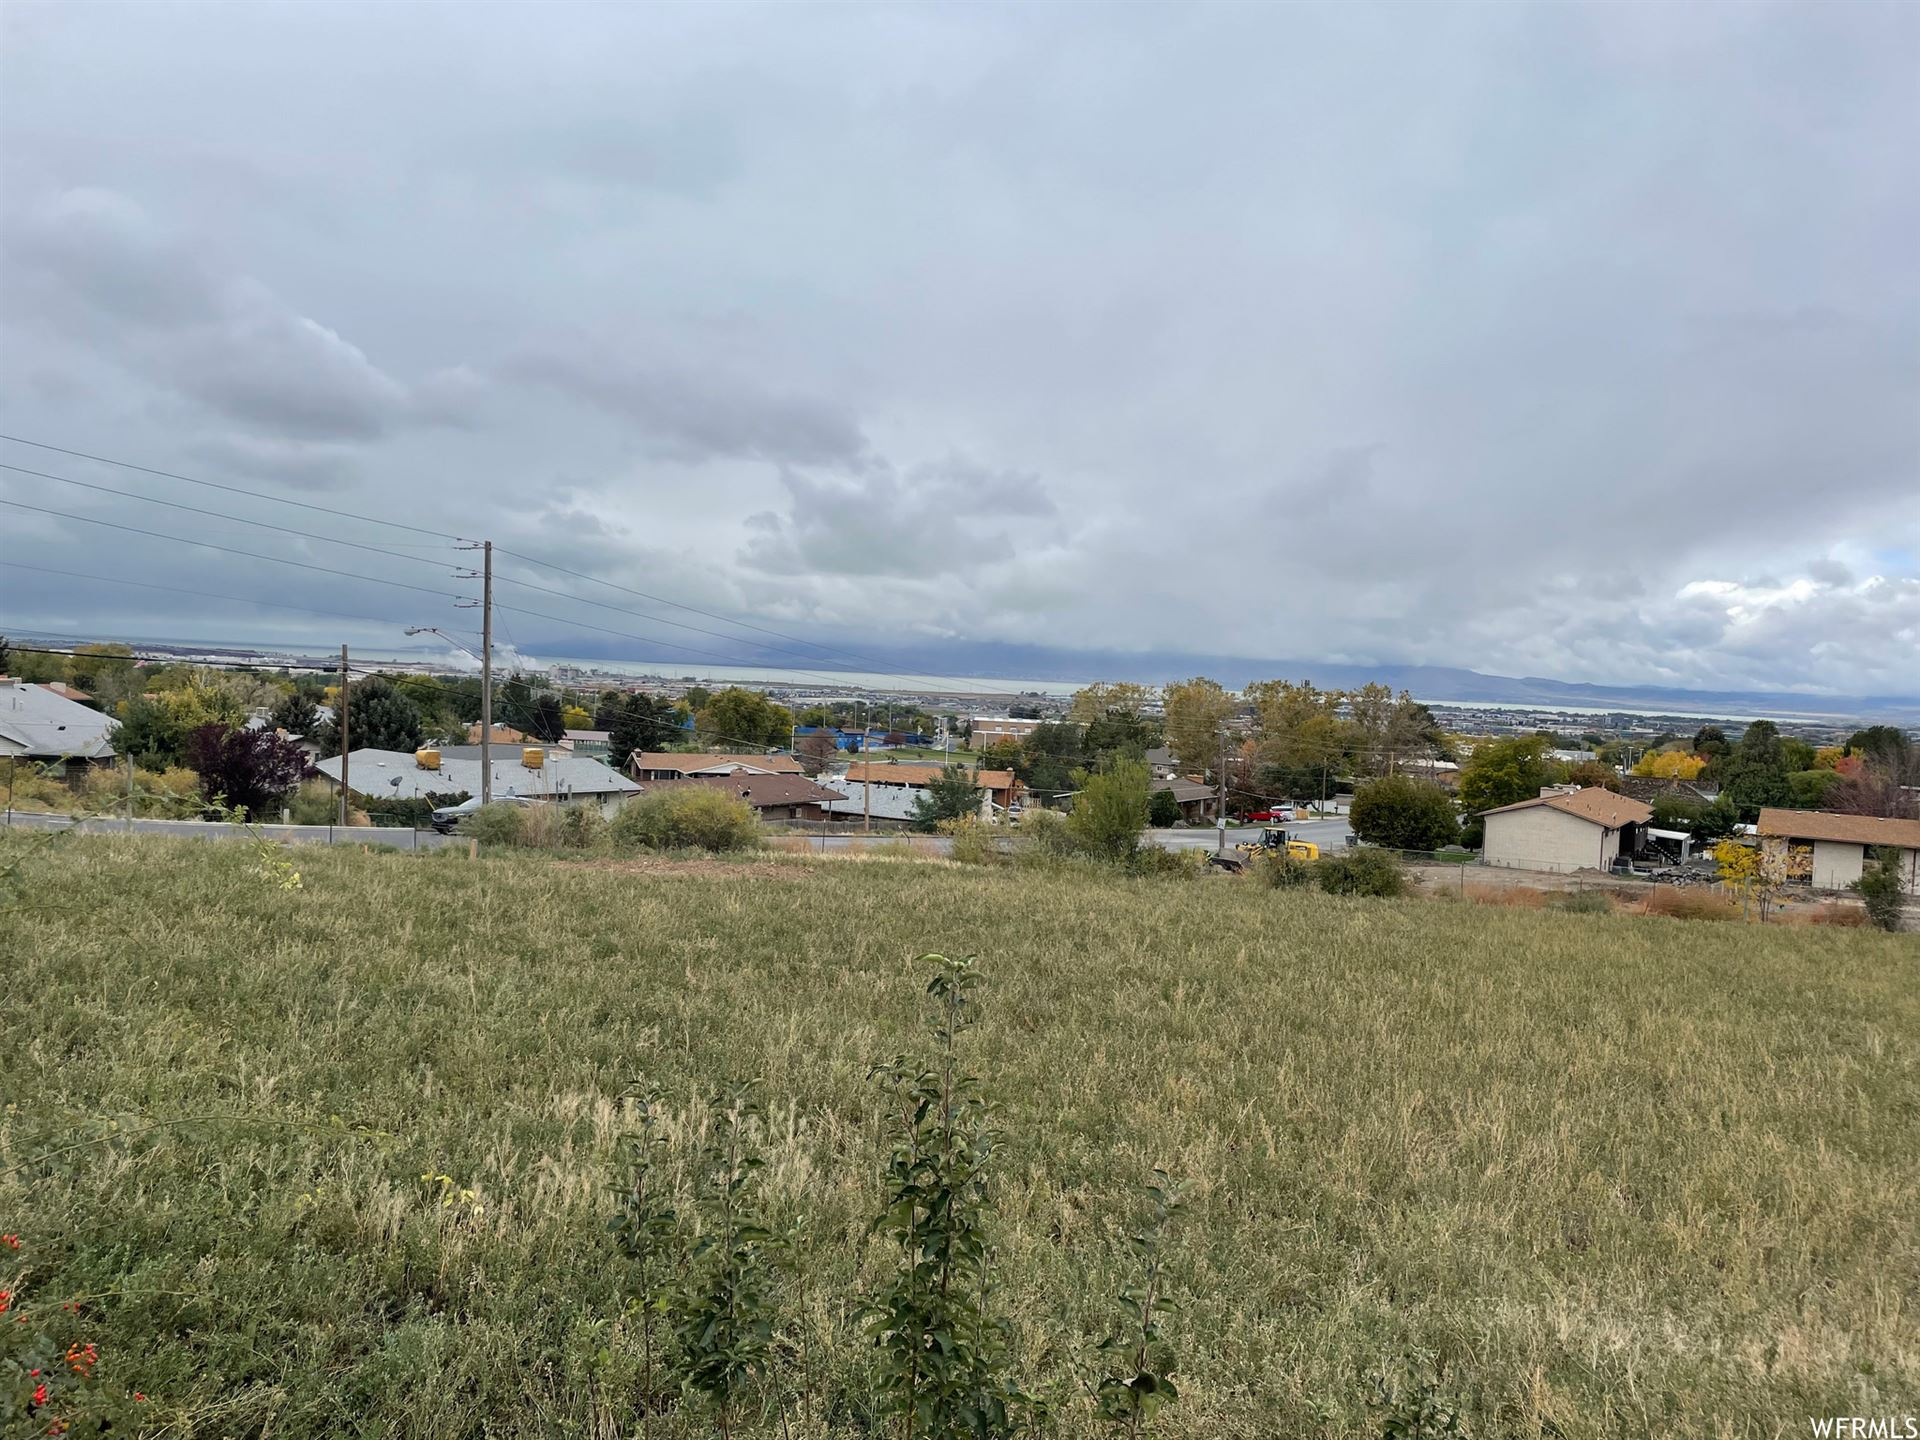 Photo of 180 S 950 E #7, Pleasant Grove, UT 84062 (MLS # 1774769)